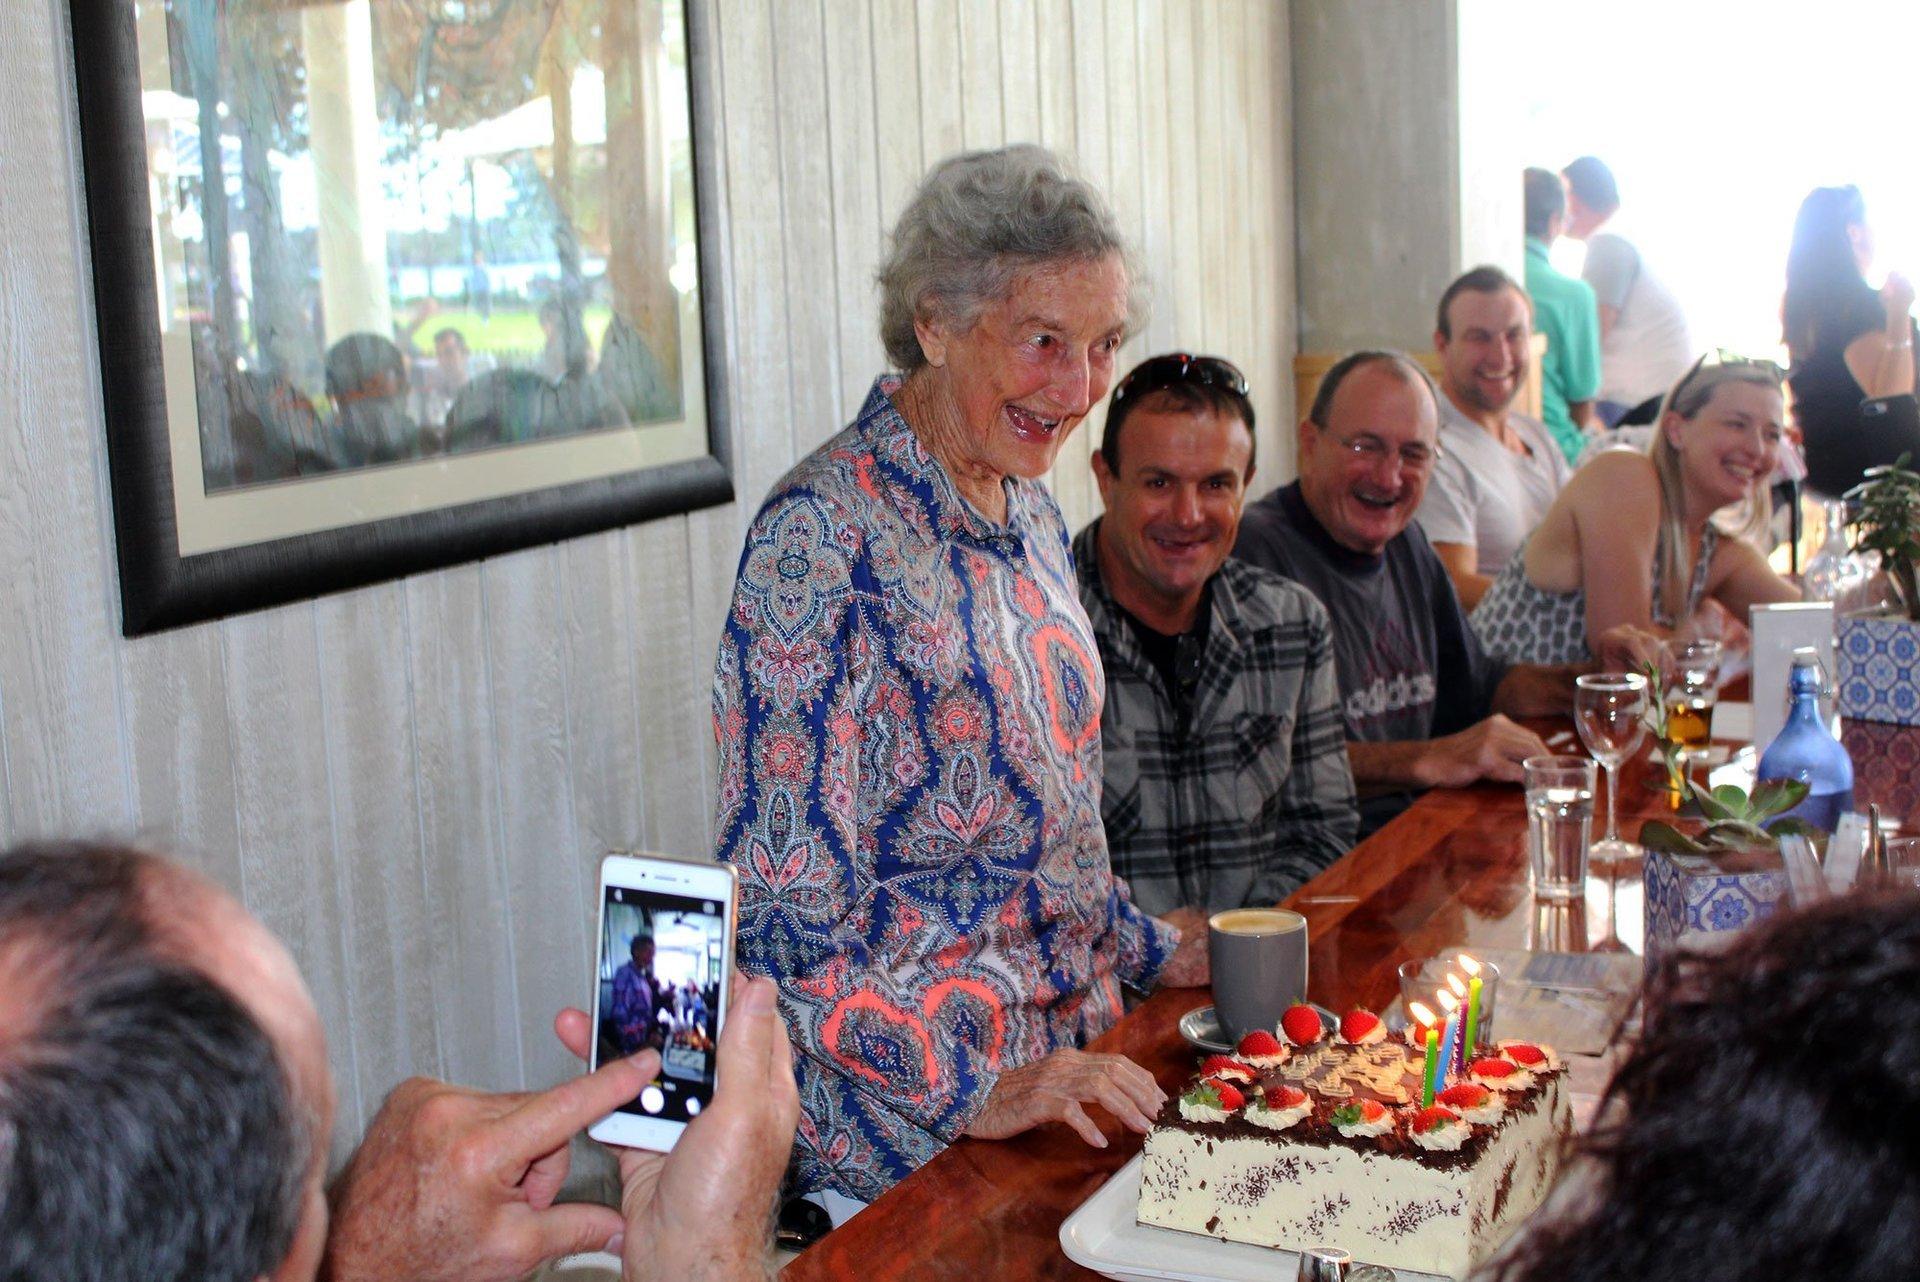 Chop 'n Chill Restaurant Customers Birthday Party